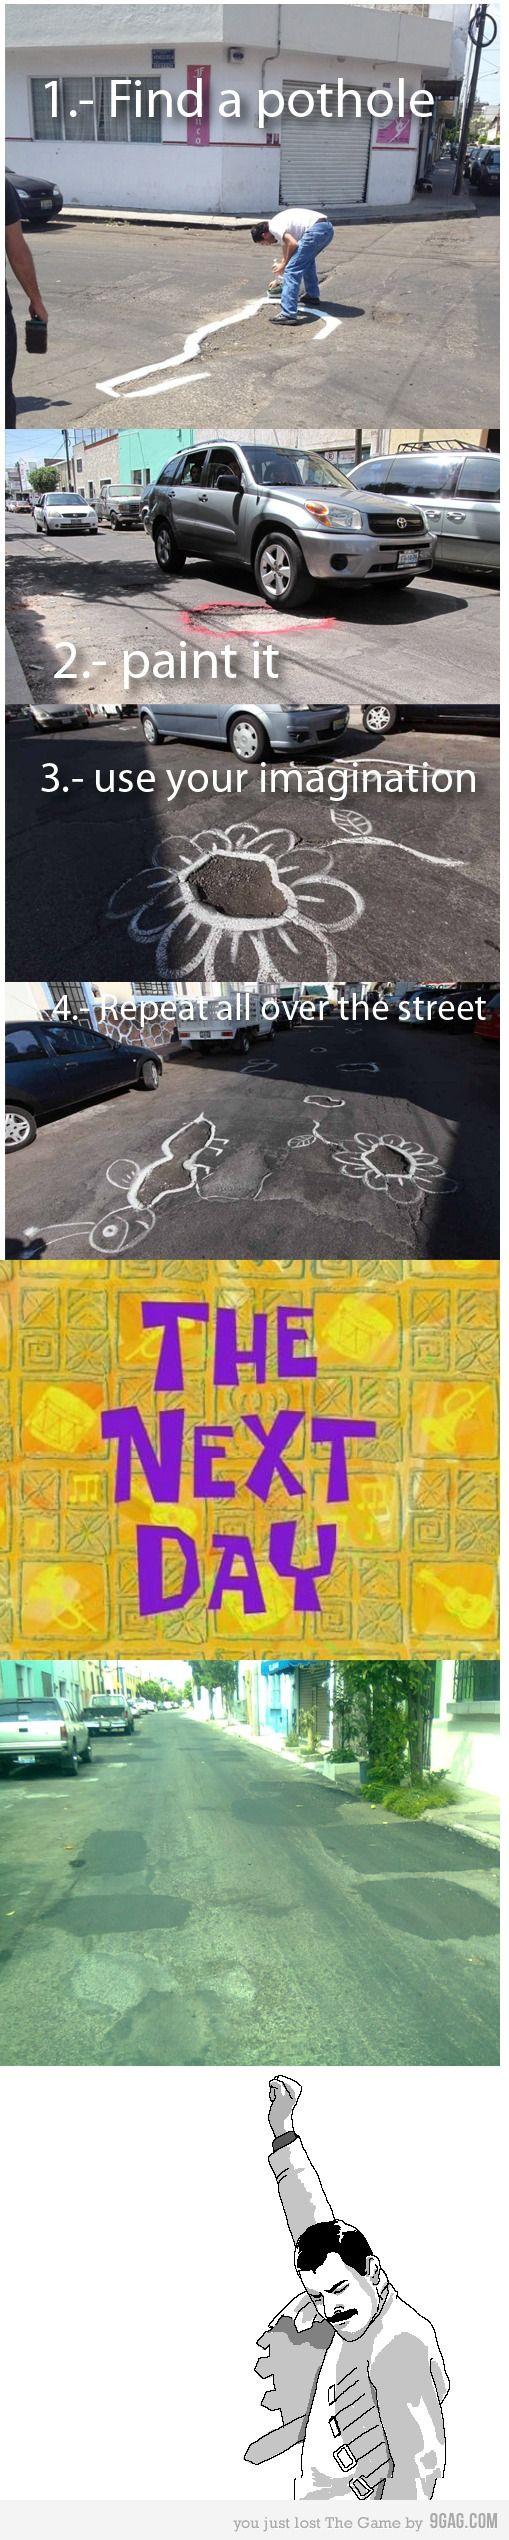 GENIUS! How to fix Potholes! Haha, click for more hilarious Car Memes! #spon #GeniusLevel